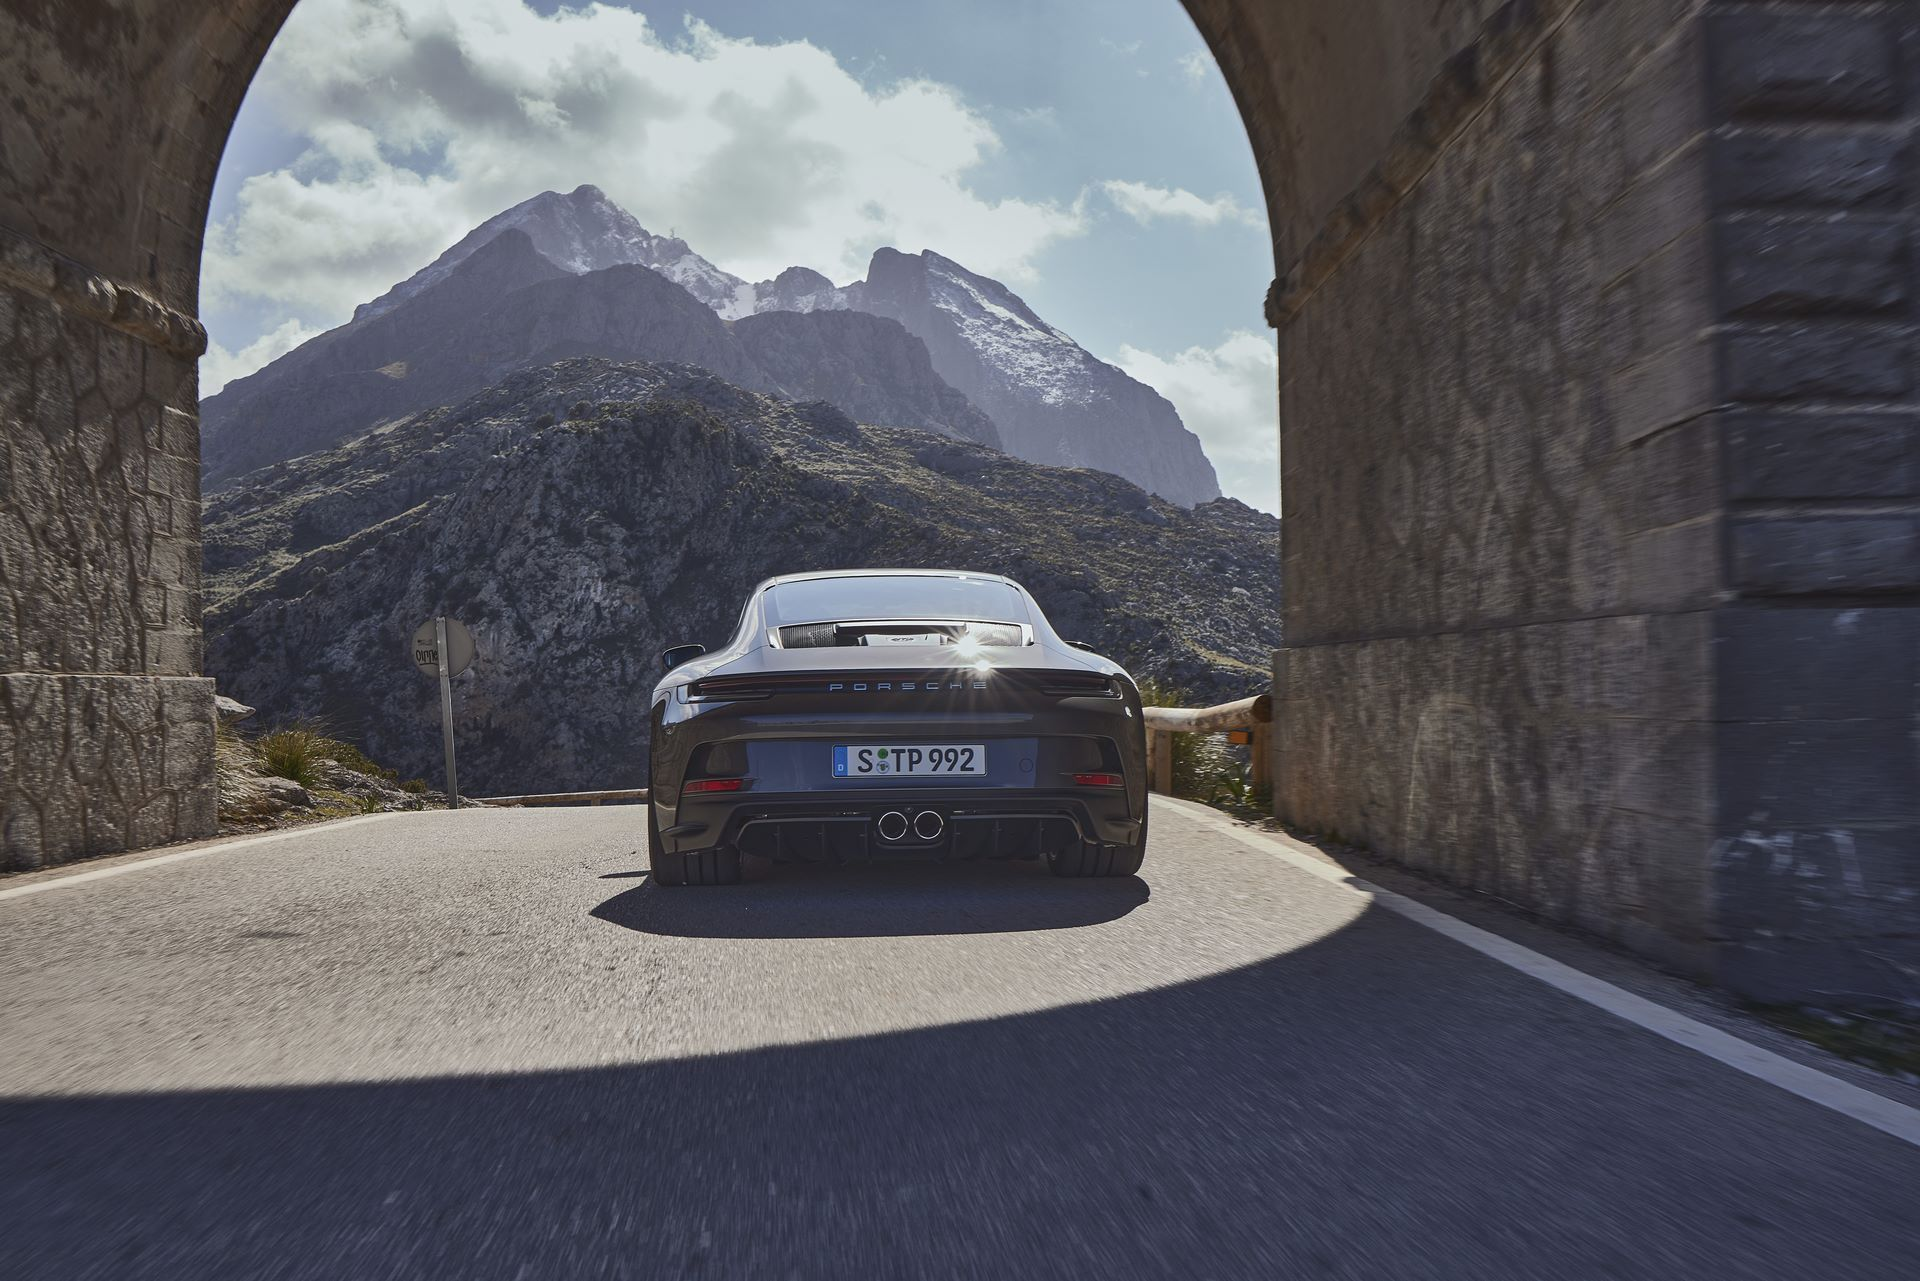 Porsche-911-GT3-Touring-Package-23